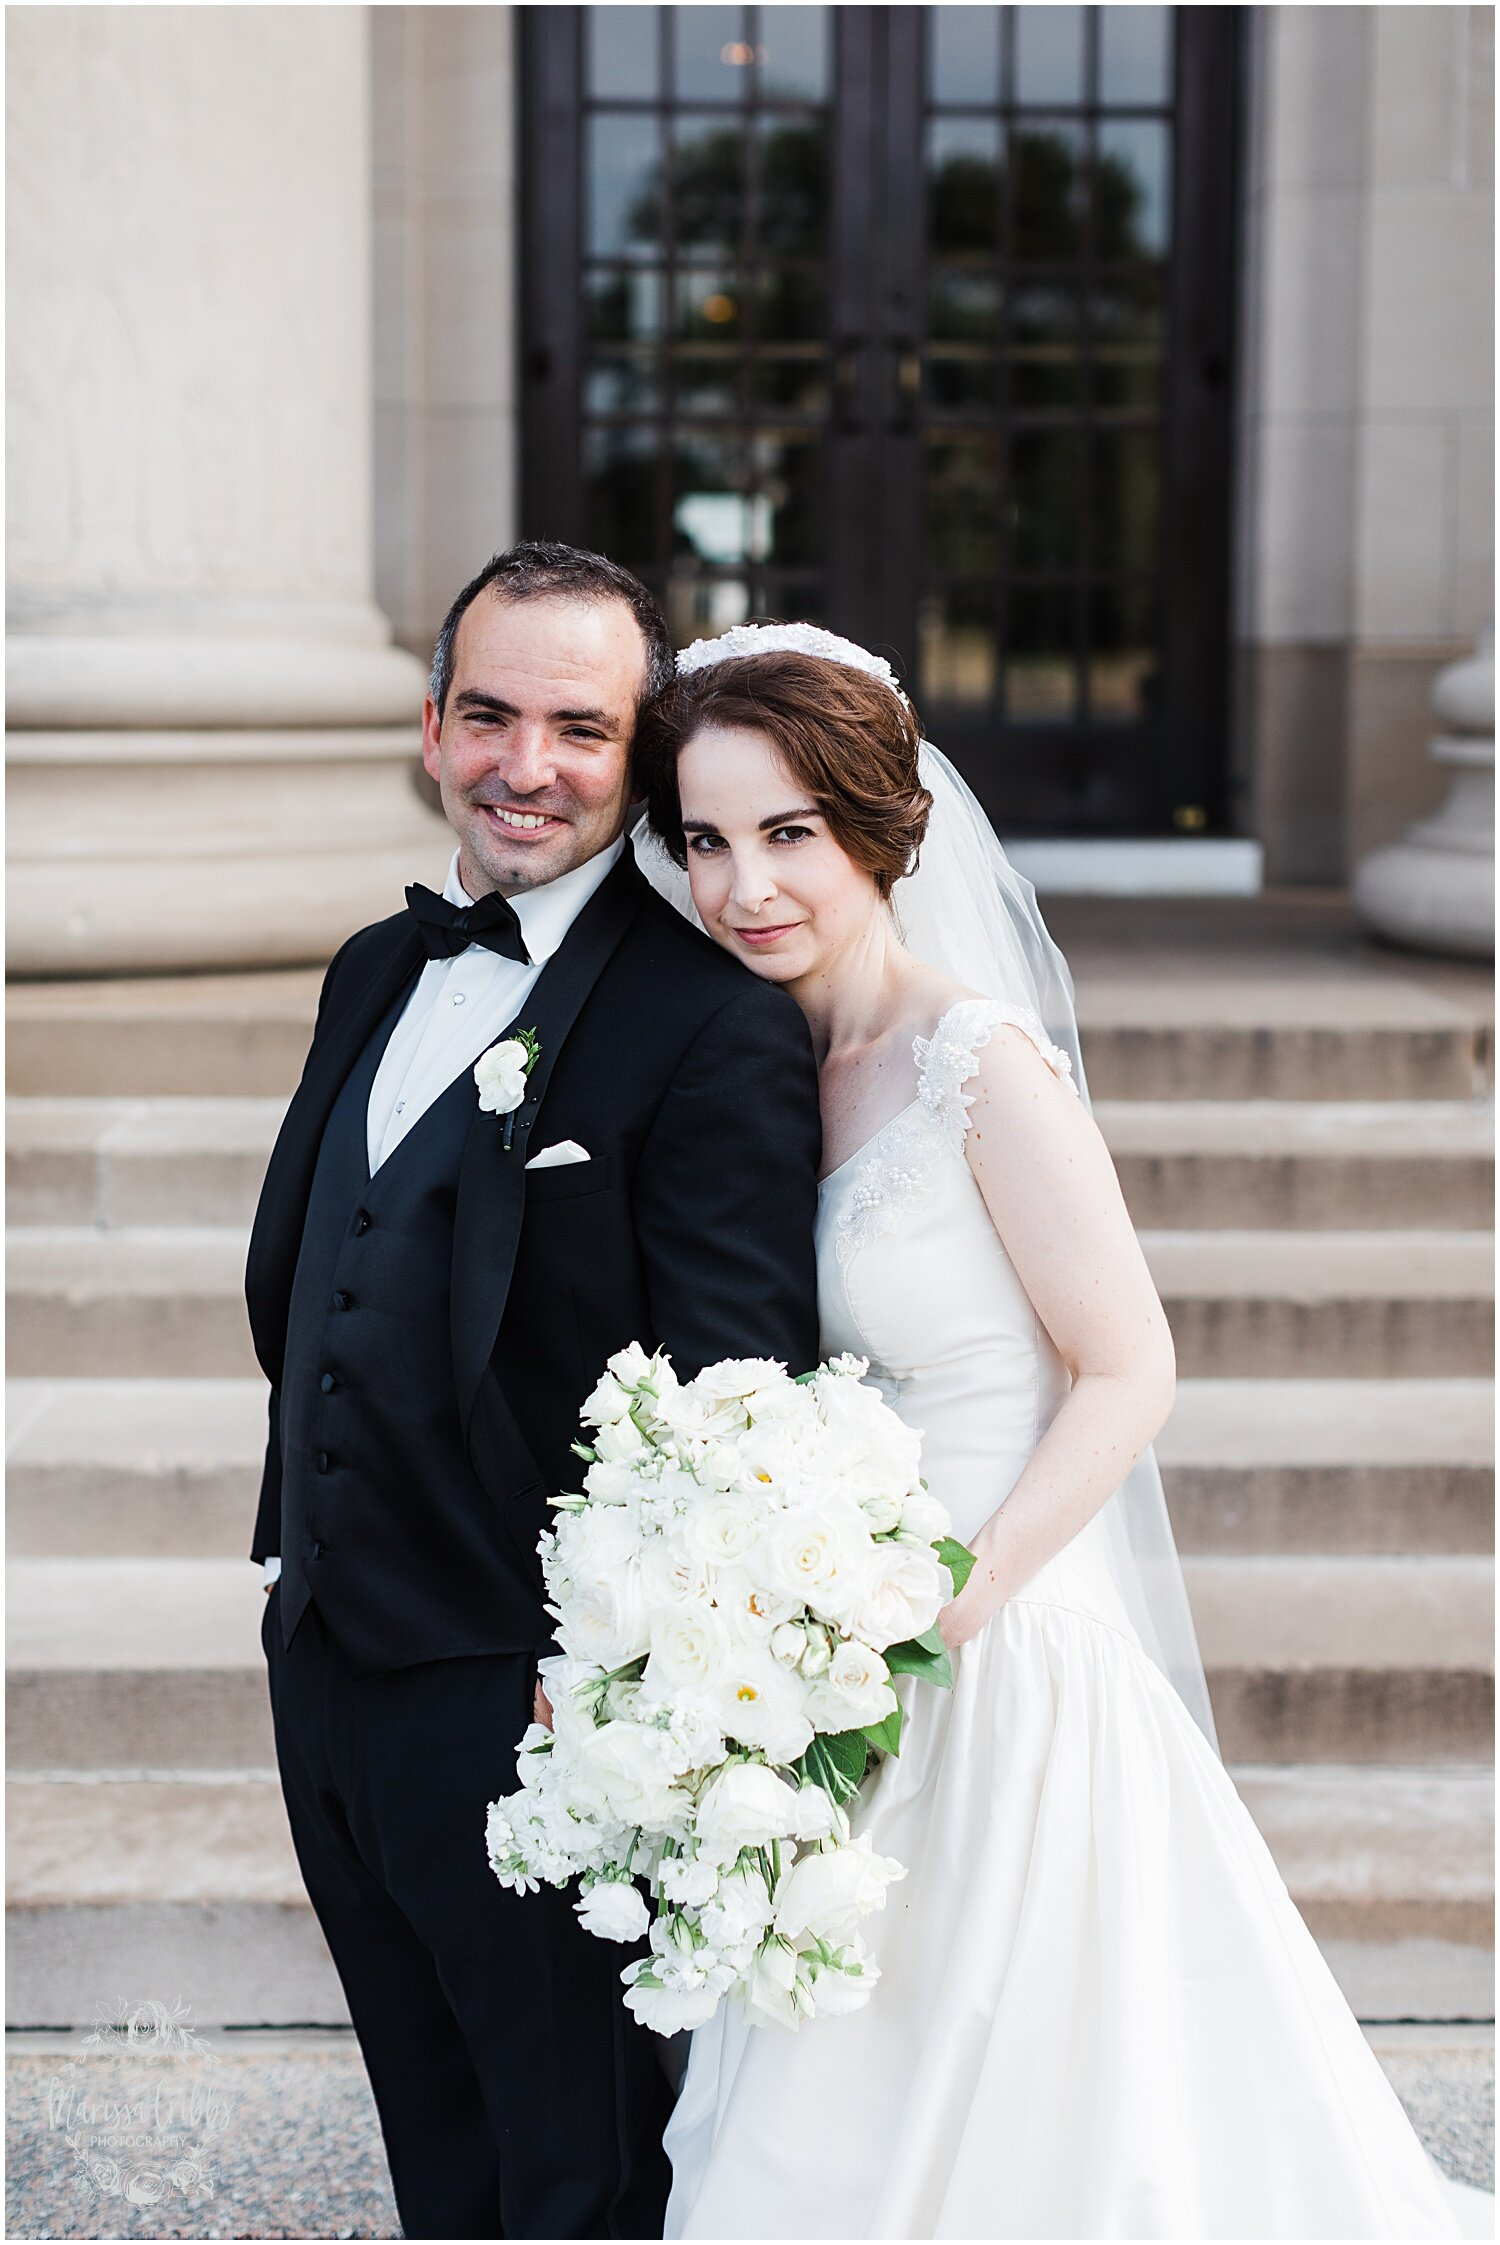 TYLER & CAROLINE MARRIED BLOG | MARISSA CRIBBS PHOTOGRAPHY | THE CARRIAGE CLUB | KANSAS CITY WEDDING PHOTOS_9253.jpg